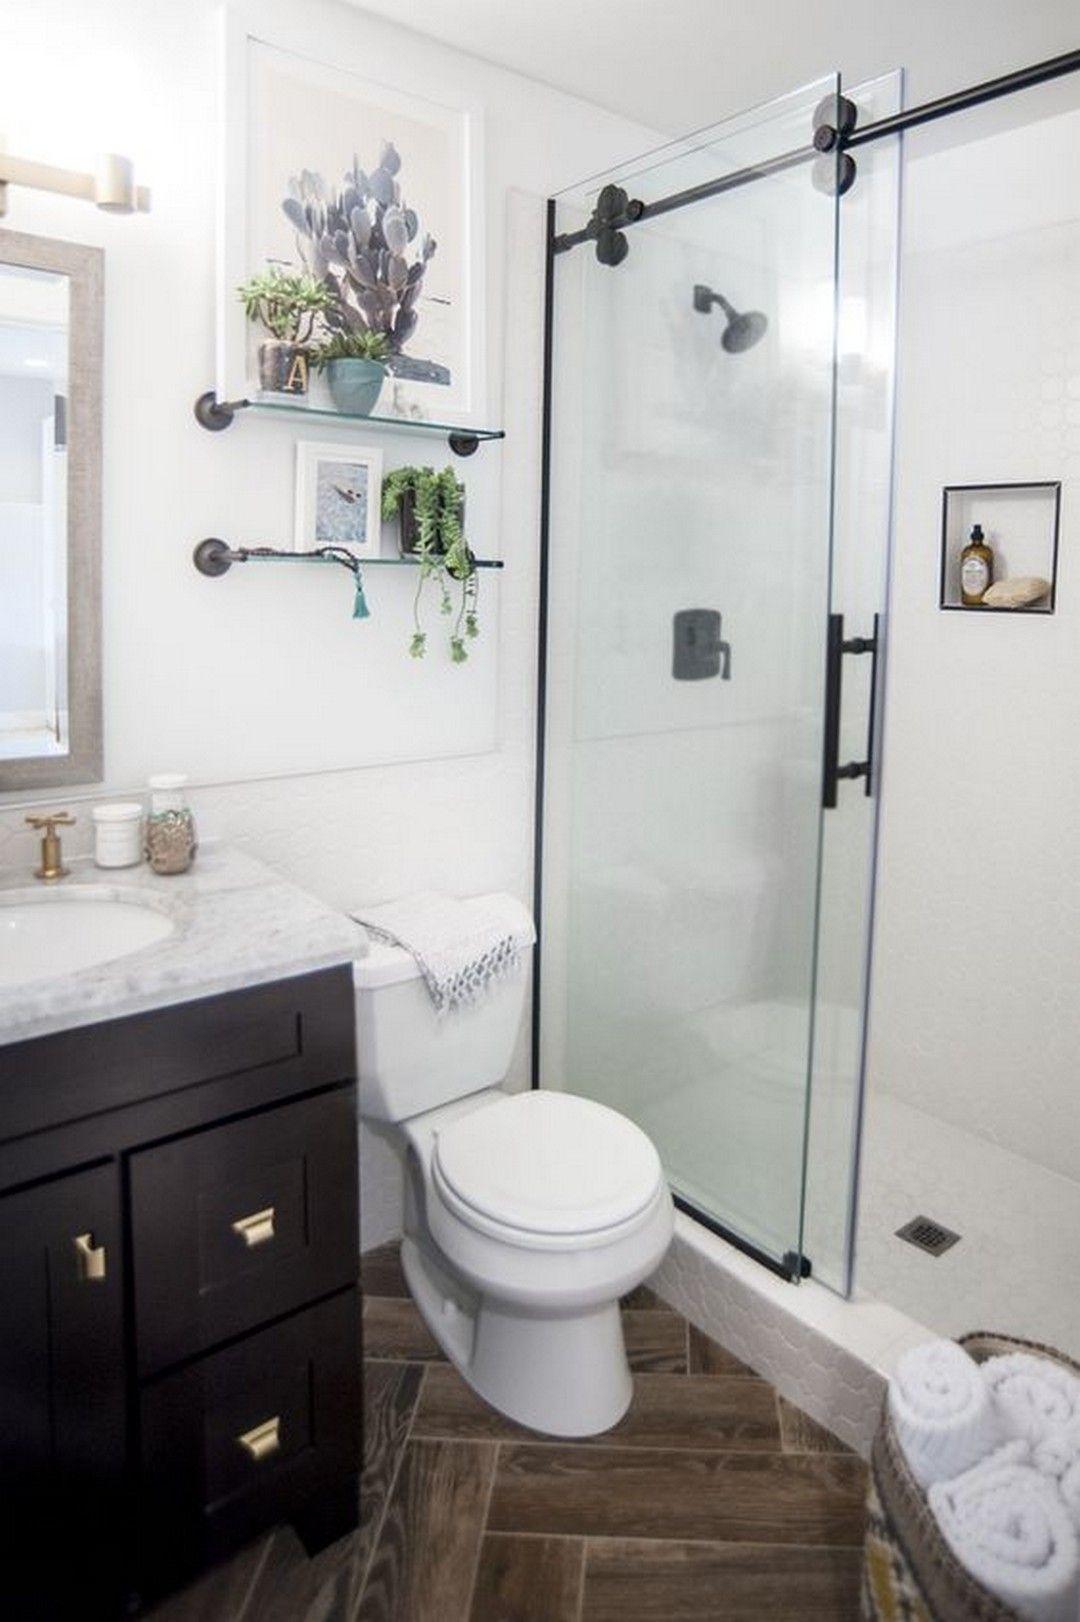 36 Stunning Small Bathroom Design That Feels Comfortable Renovasi Kamar Mandi Inspirasi Kamar Mandi Ide Kamar Mandi